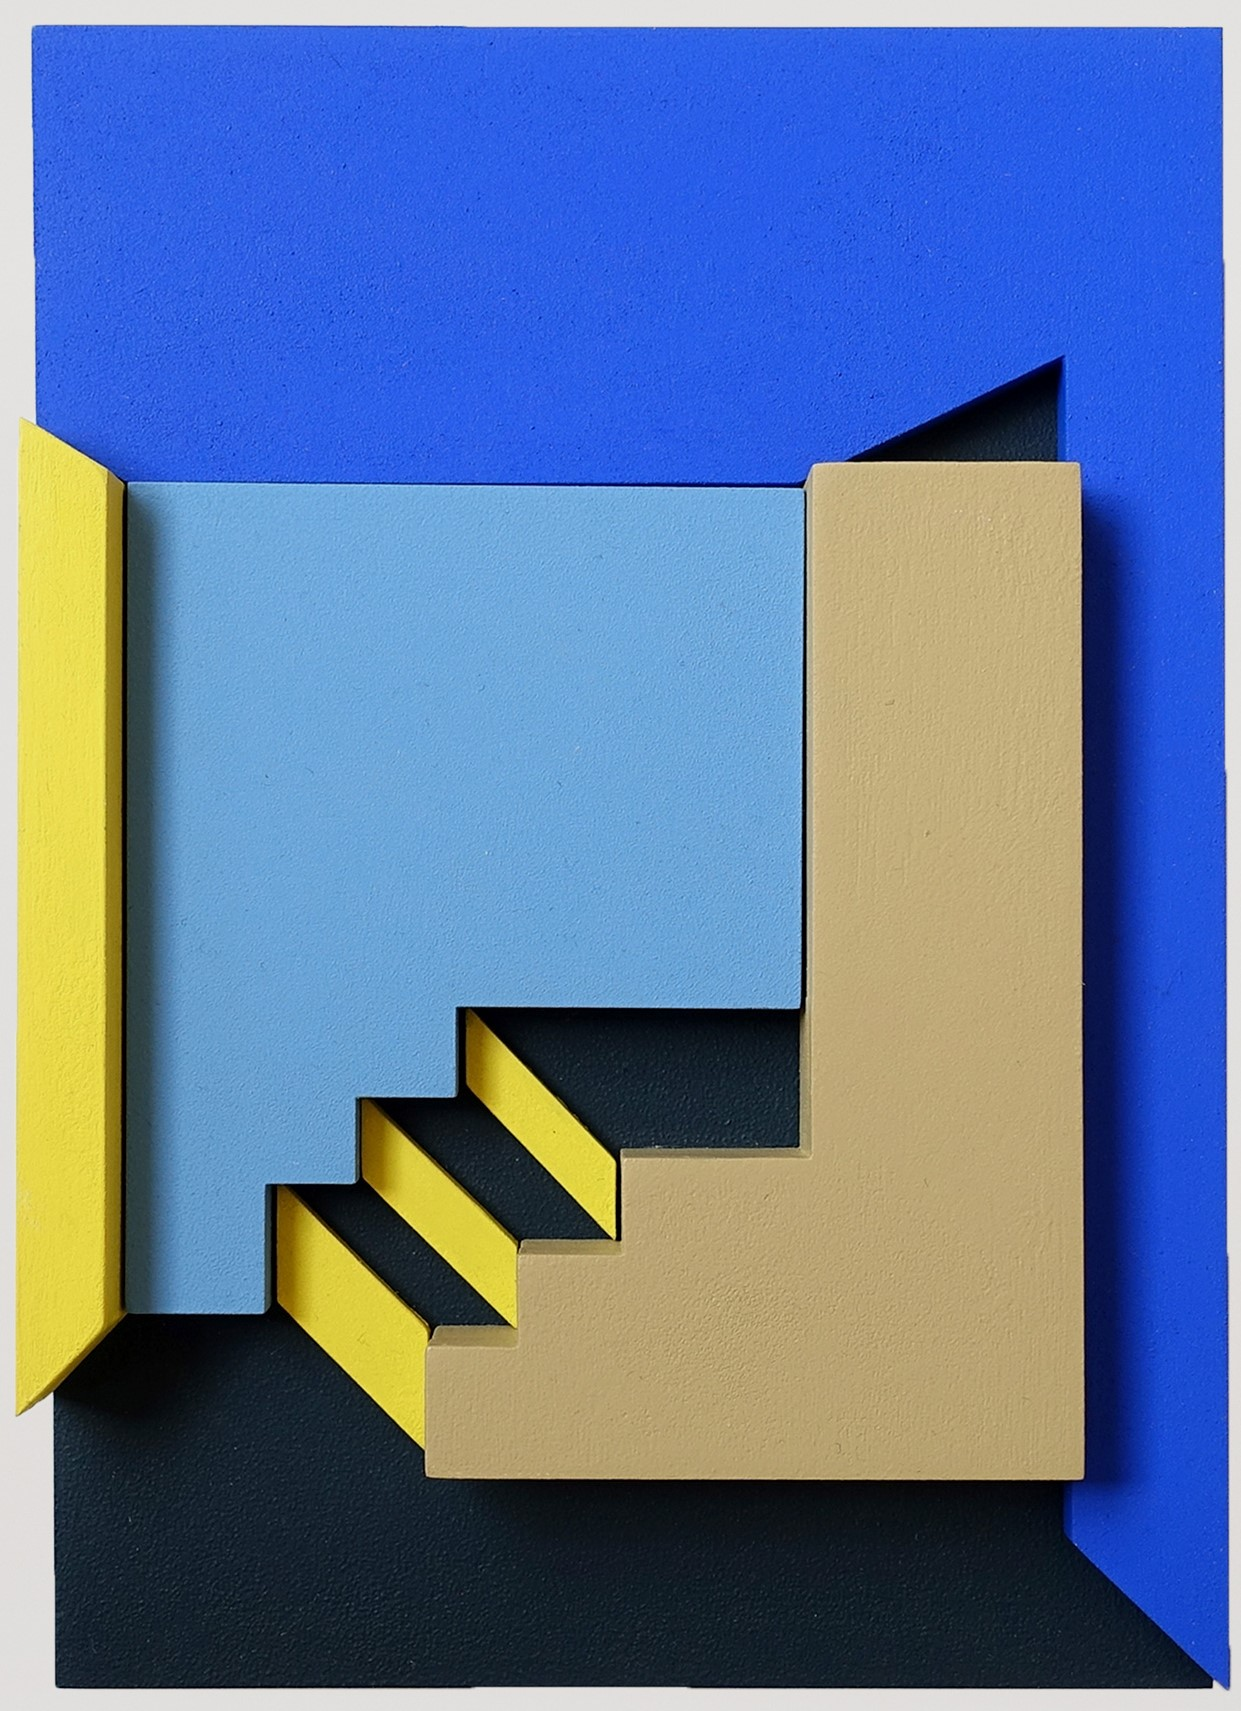 L000075 House of Grey House Blue stairs_emilyforgot-2.jpg